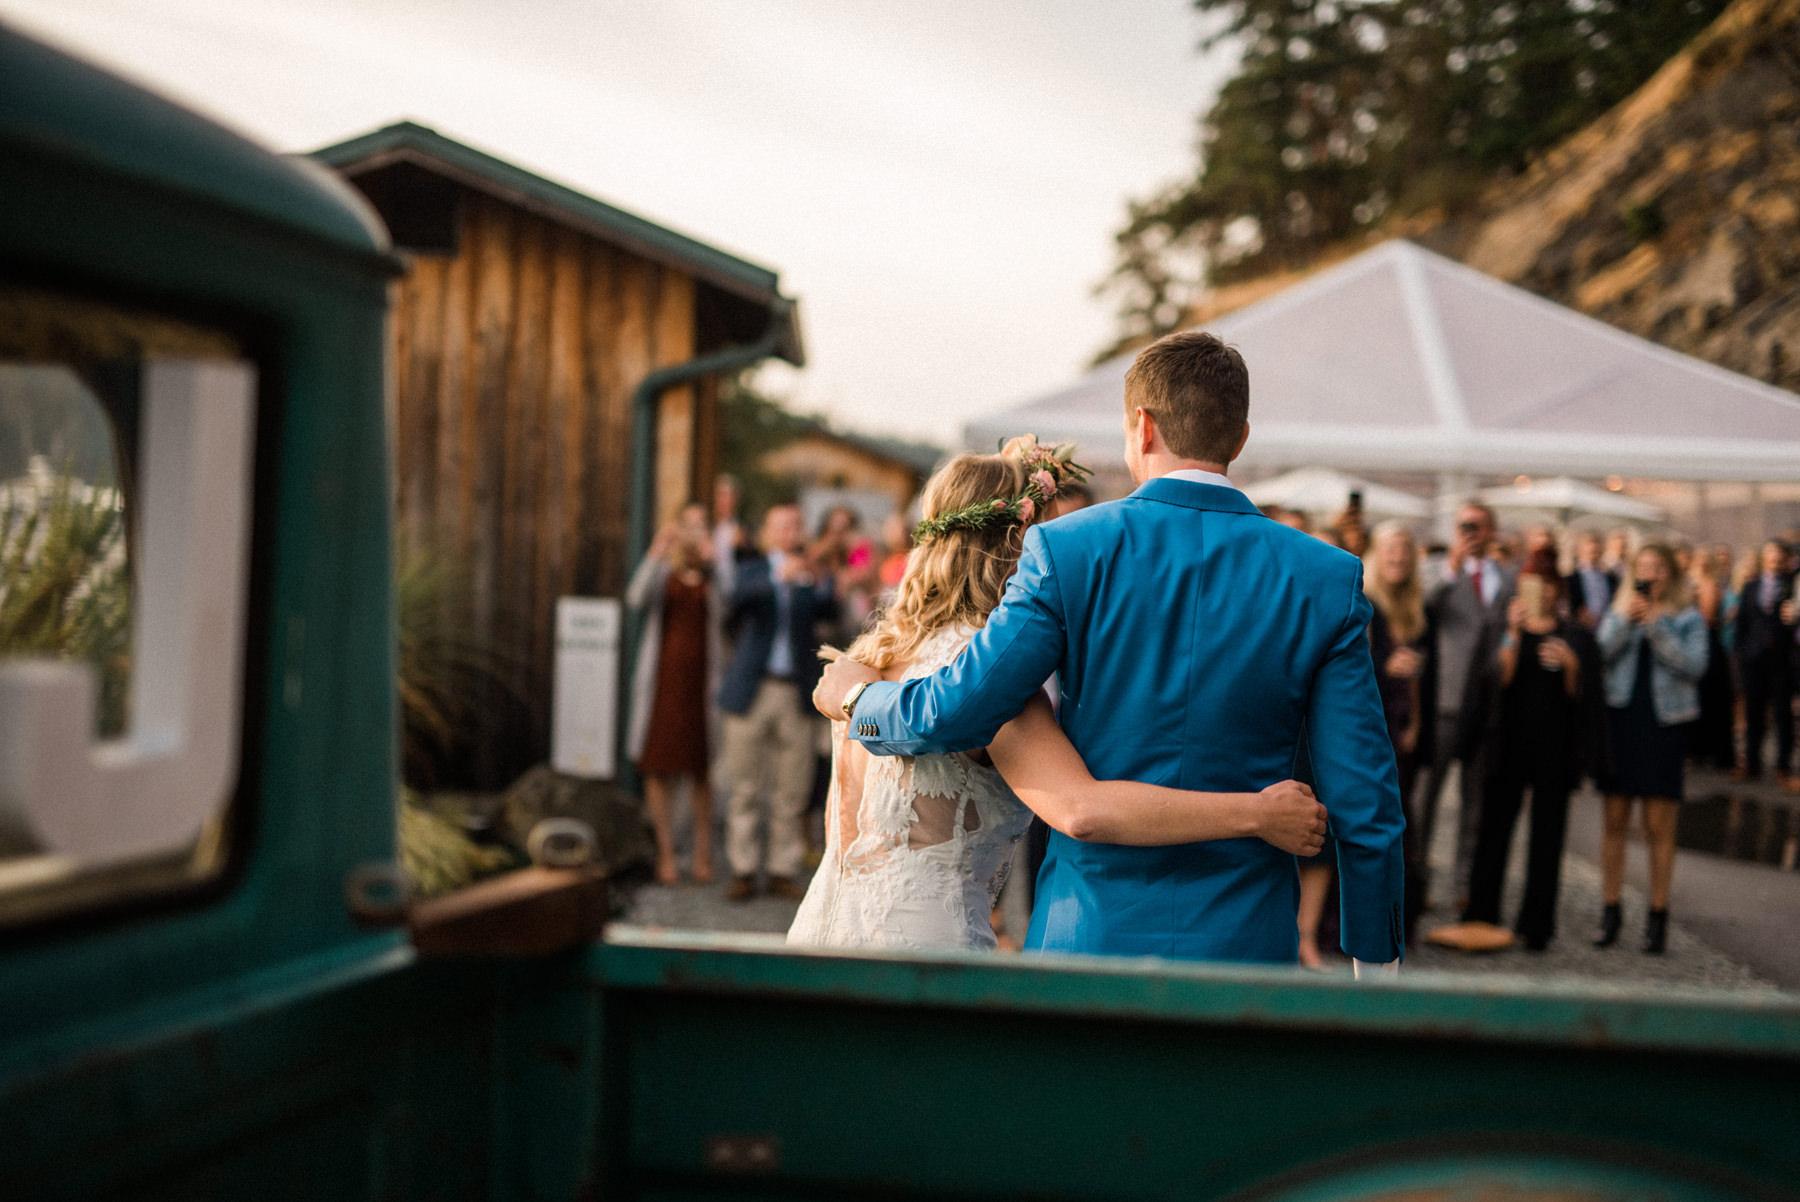 361-colorful-outdoor-lopez-island-wedding.jpg